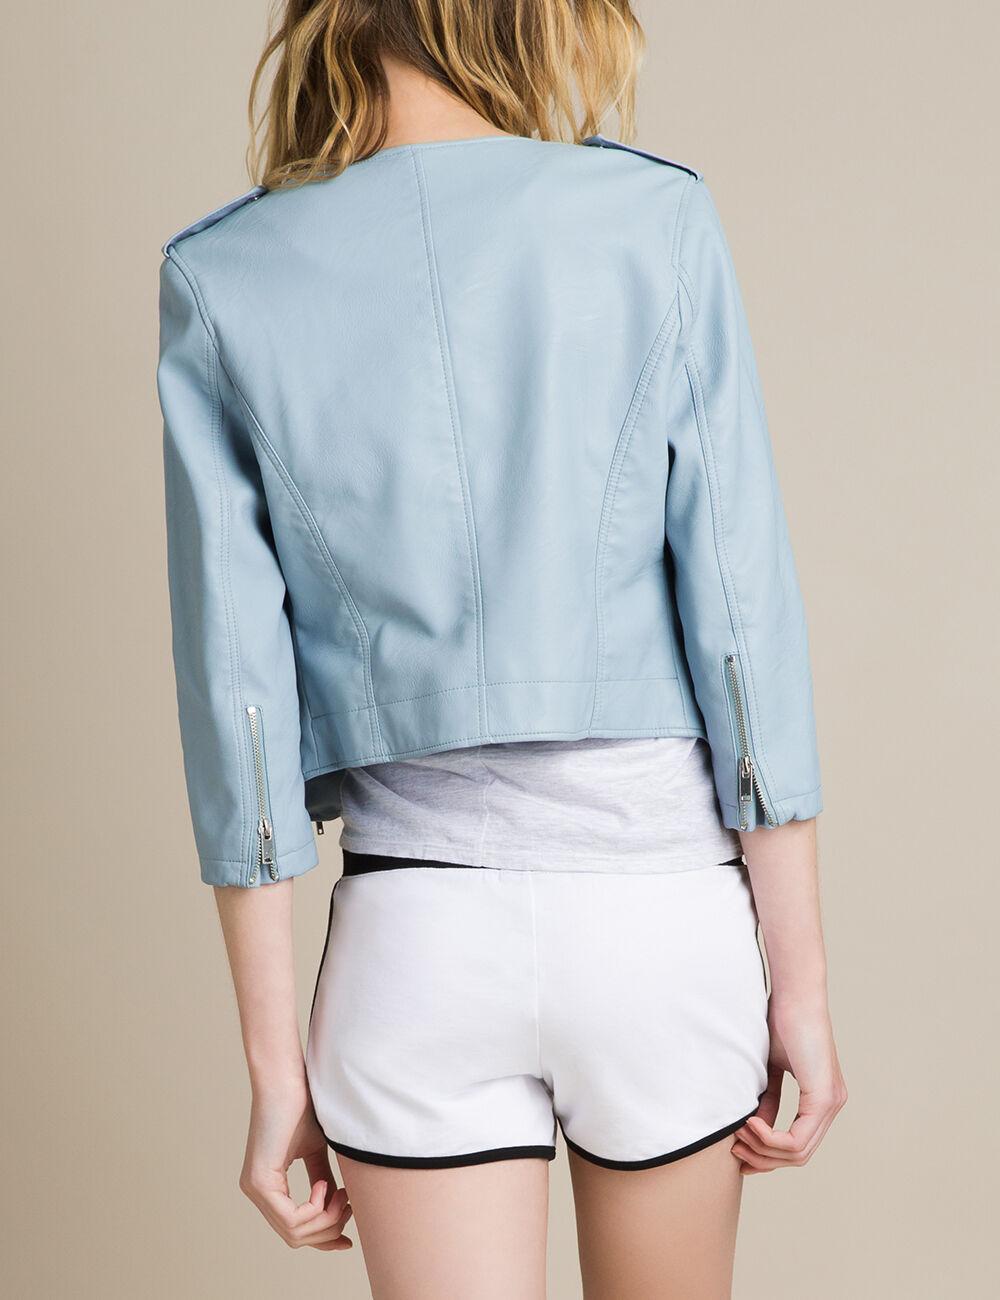 6c0321f62ffbf blouson femme bleu ciel,Gilet veste femme